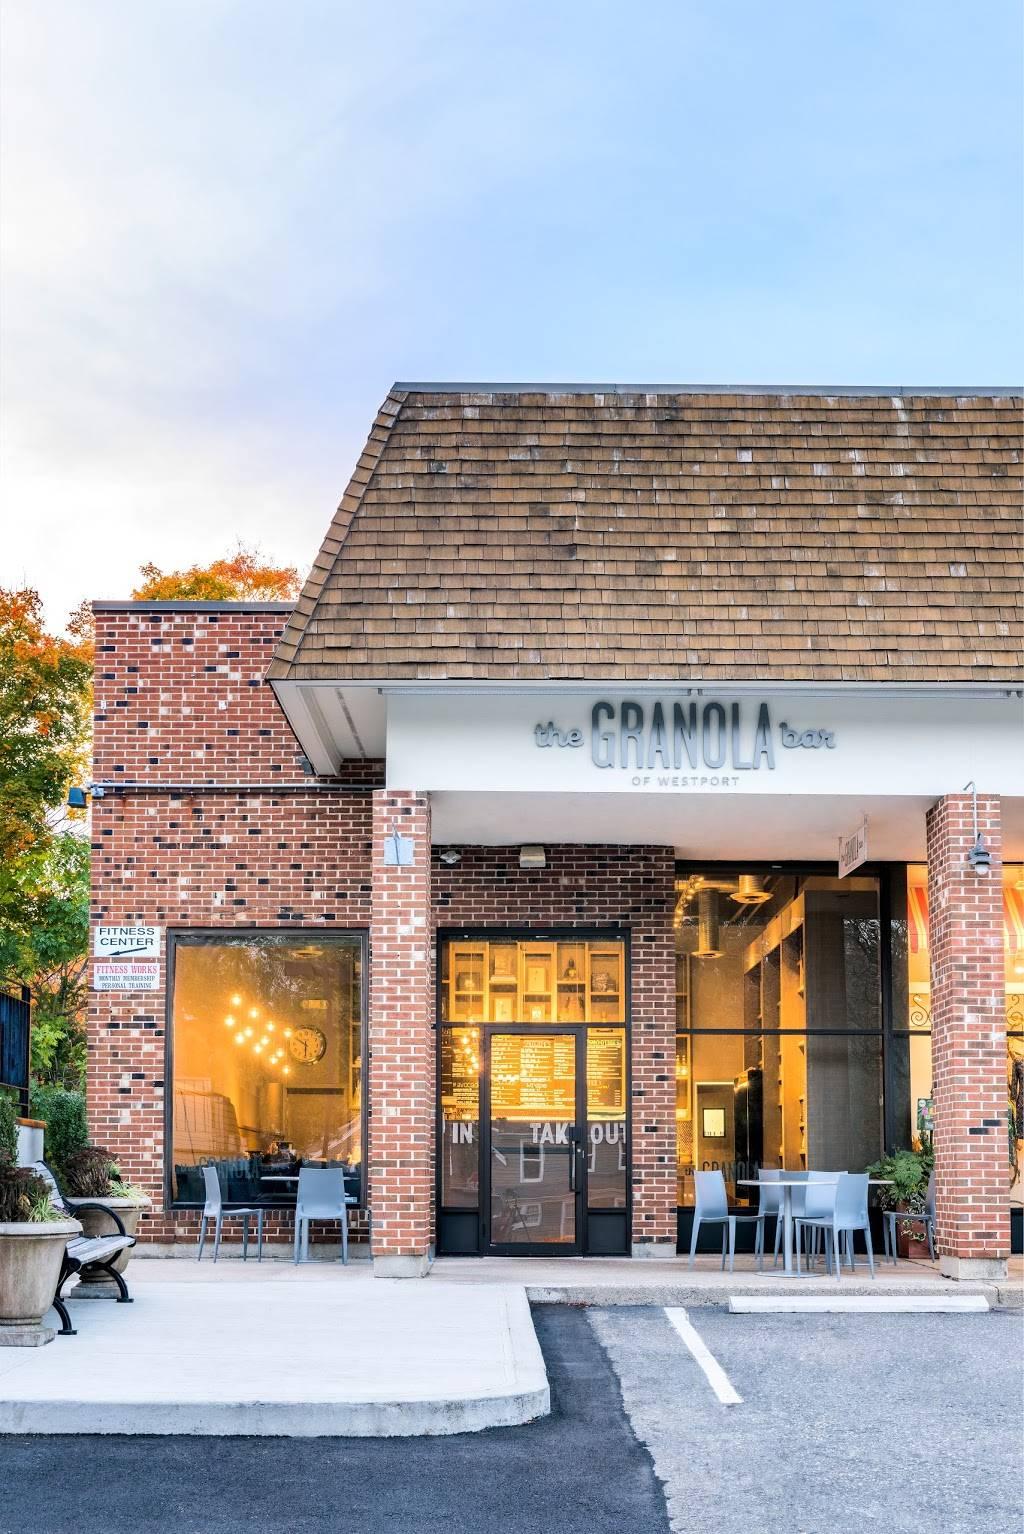 The Granola Bar of Westport   cafe   275 Post Rd E, Westport, CT 06880, USA   2033495202 OR +1 203-349-5202